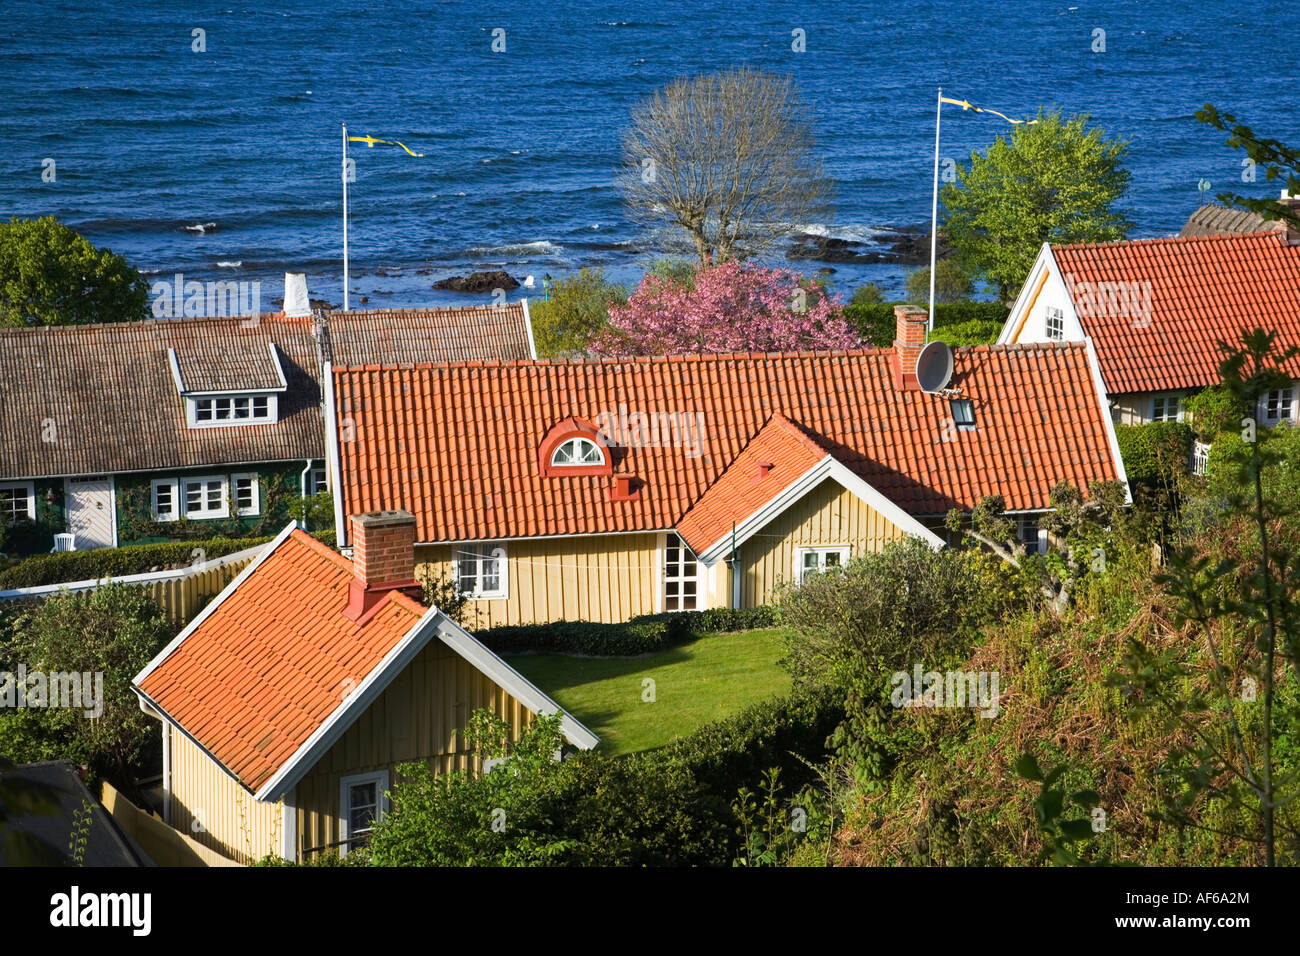 Sweden Skåne Scania Kullen Viken houses swedish national flag and scenic coastline May 2006 - Stock Image